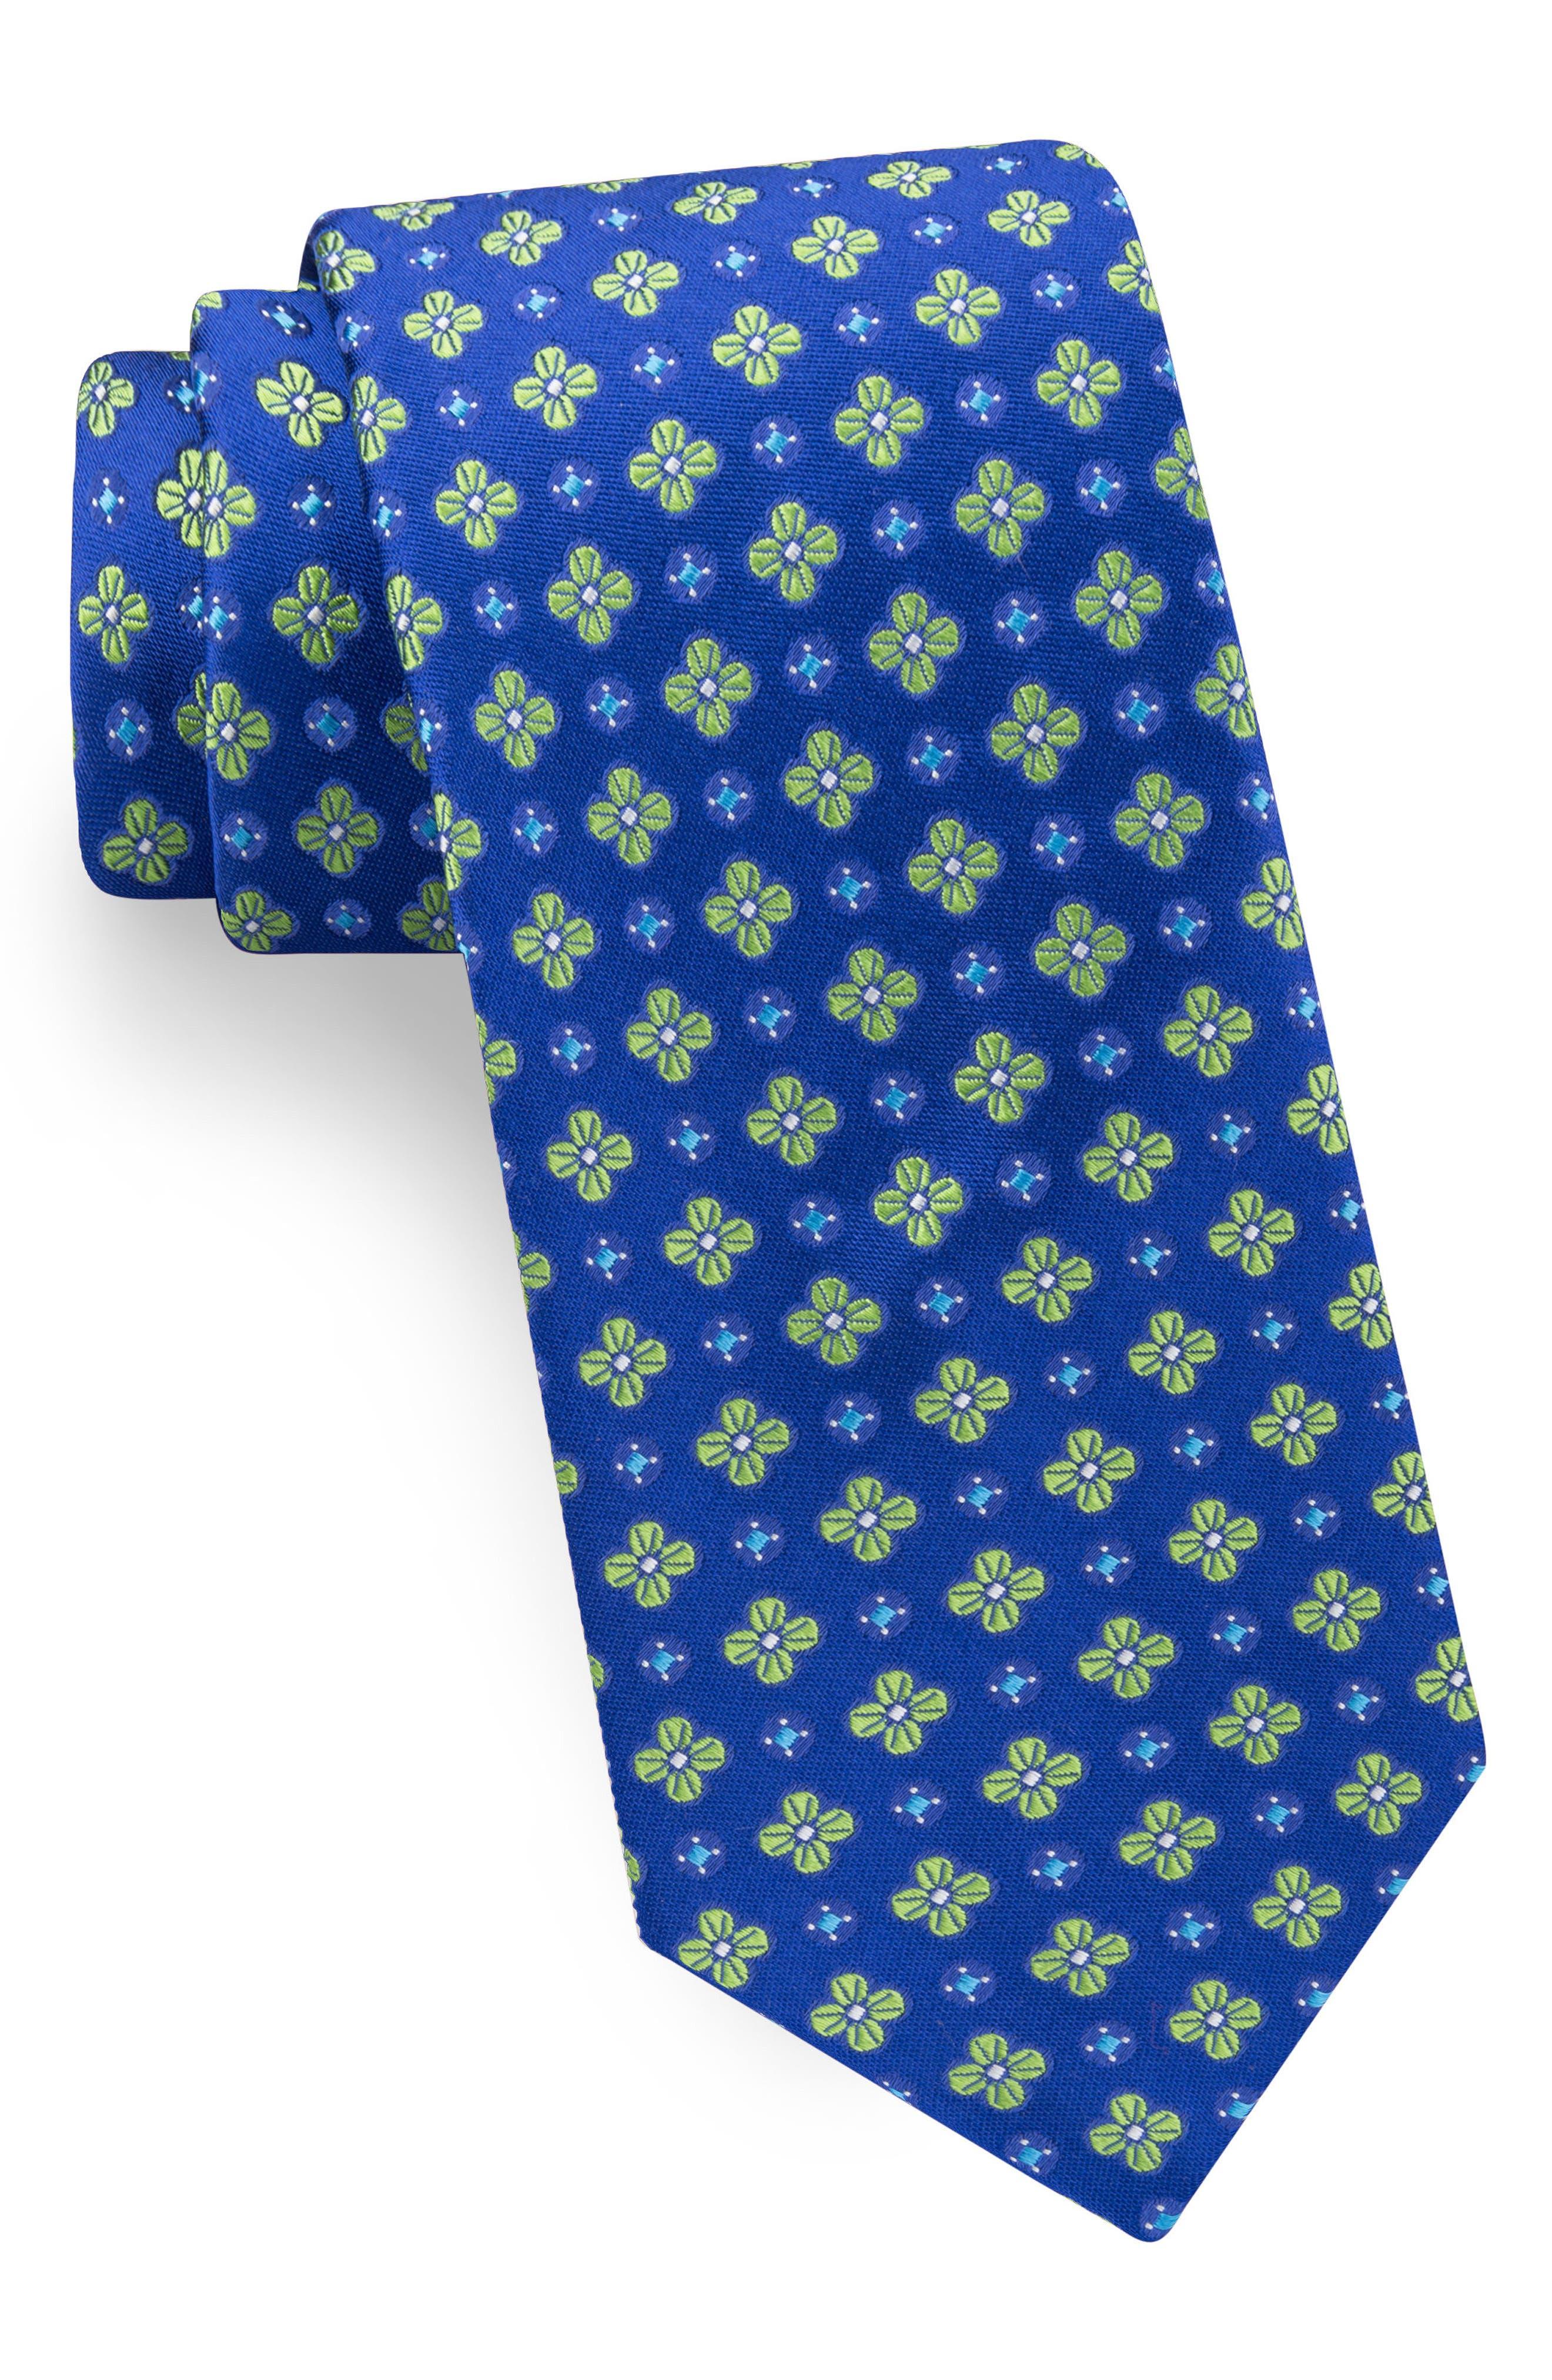 Lansbury Floral Silk Tie,                         Main,                         color, Royal Blue